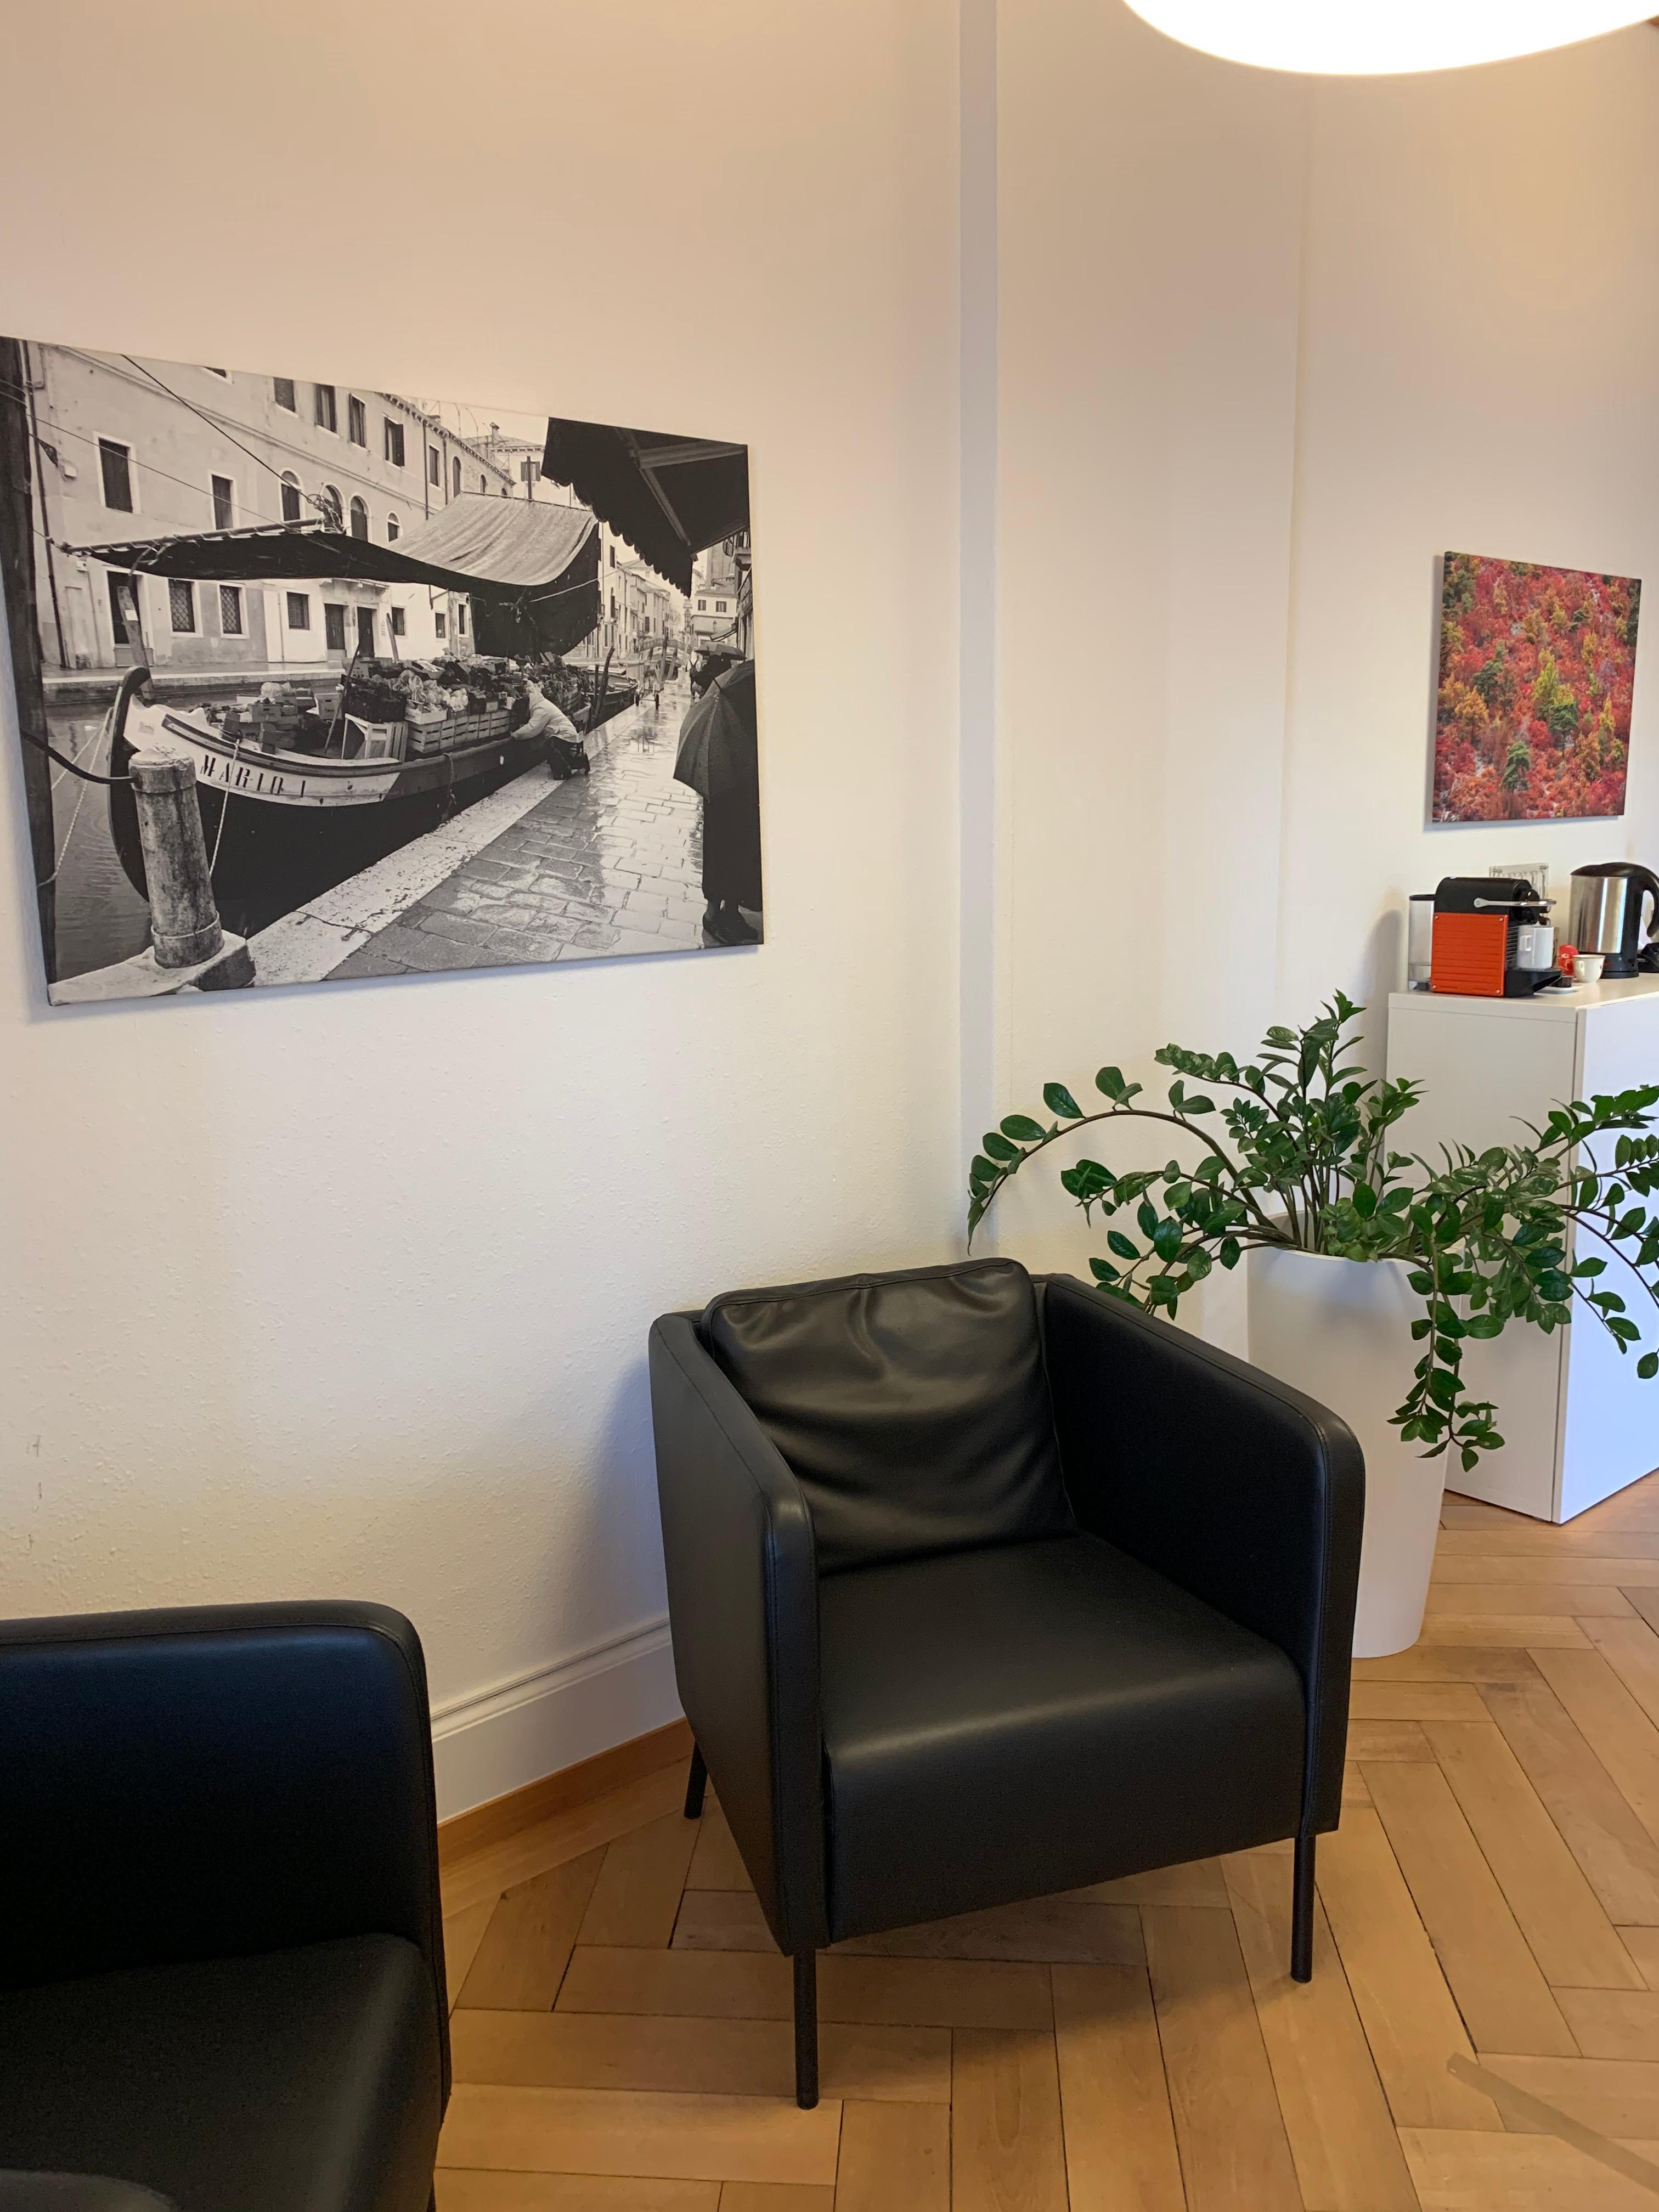 professional language center